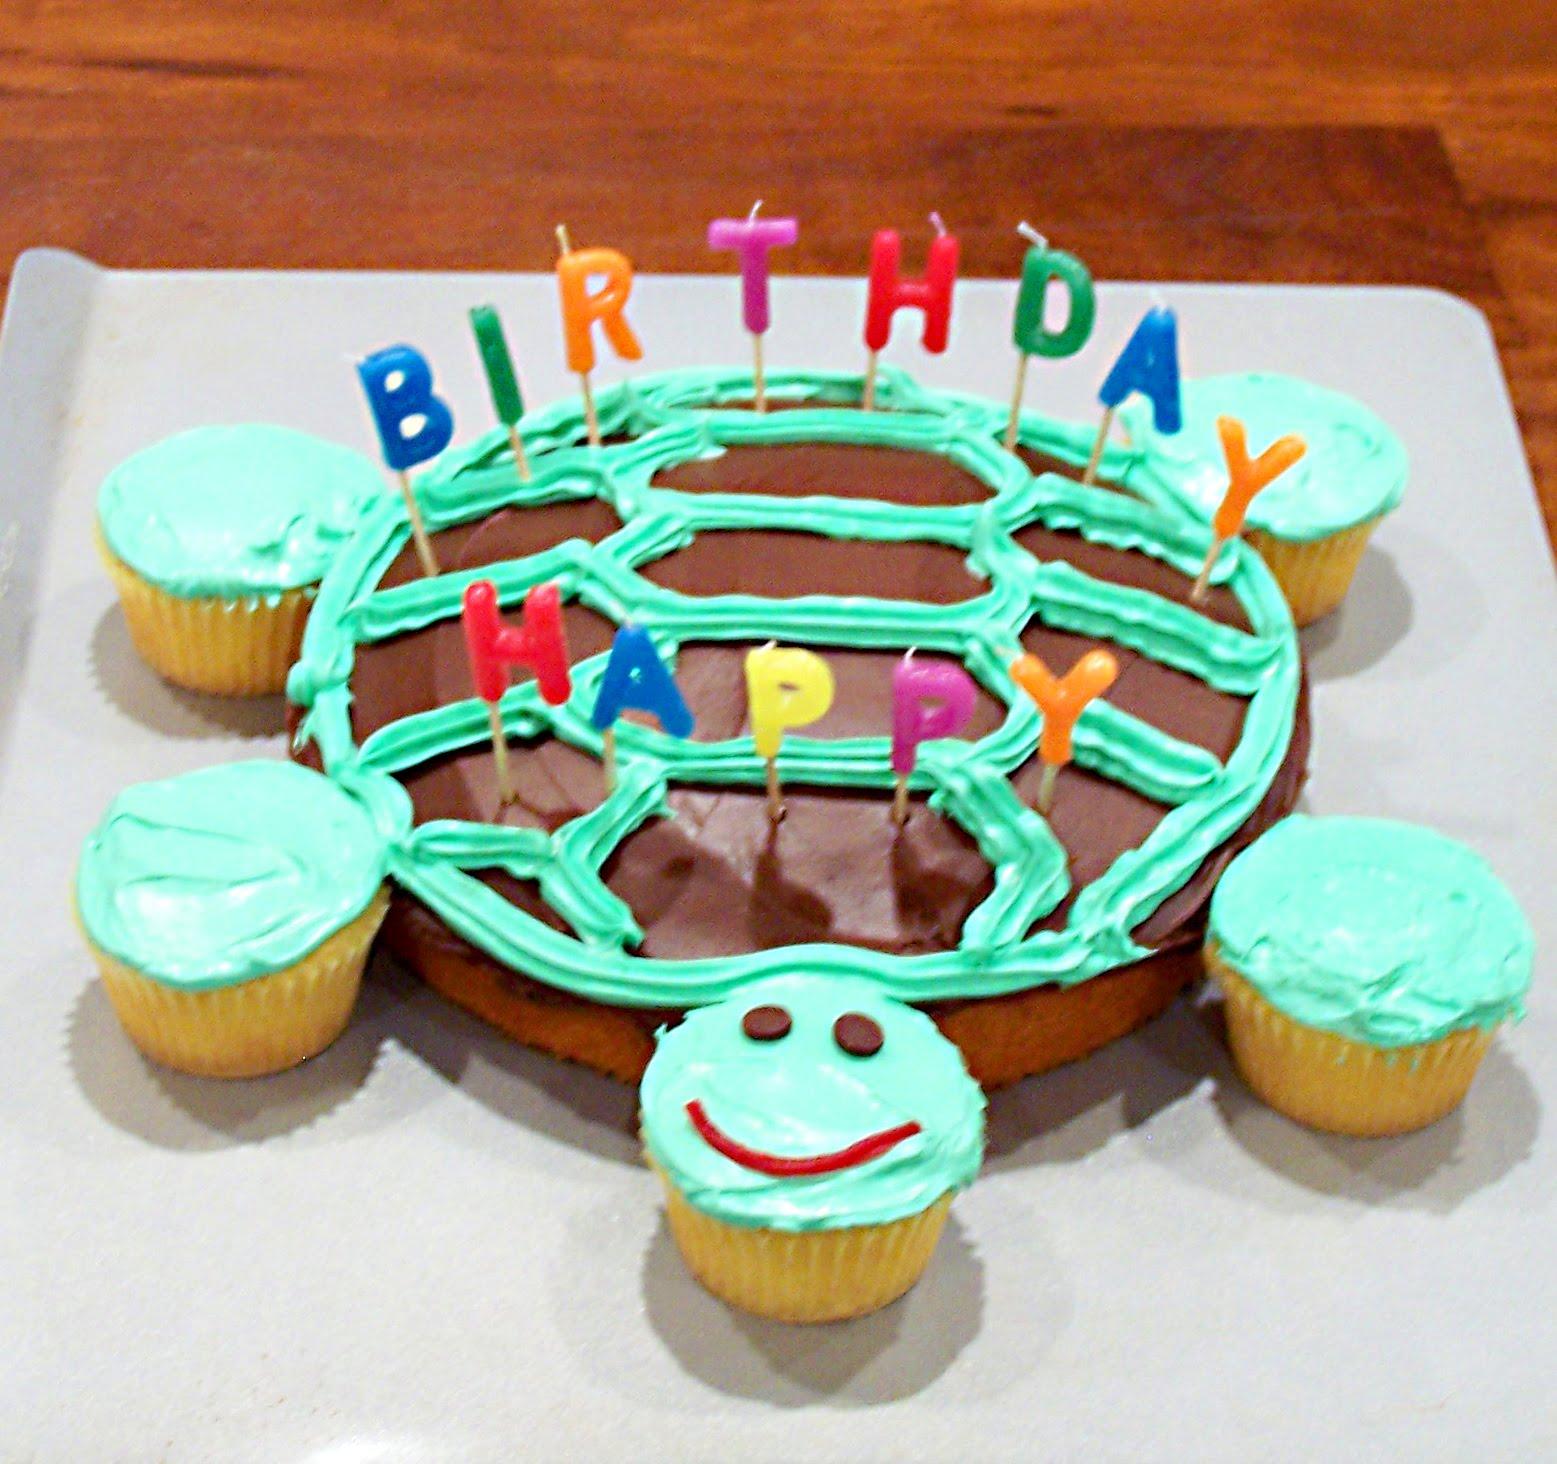 Easy Birthday Cake Ideas: All Boy Stuff: Easy Birthday Cakes